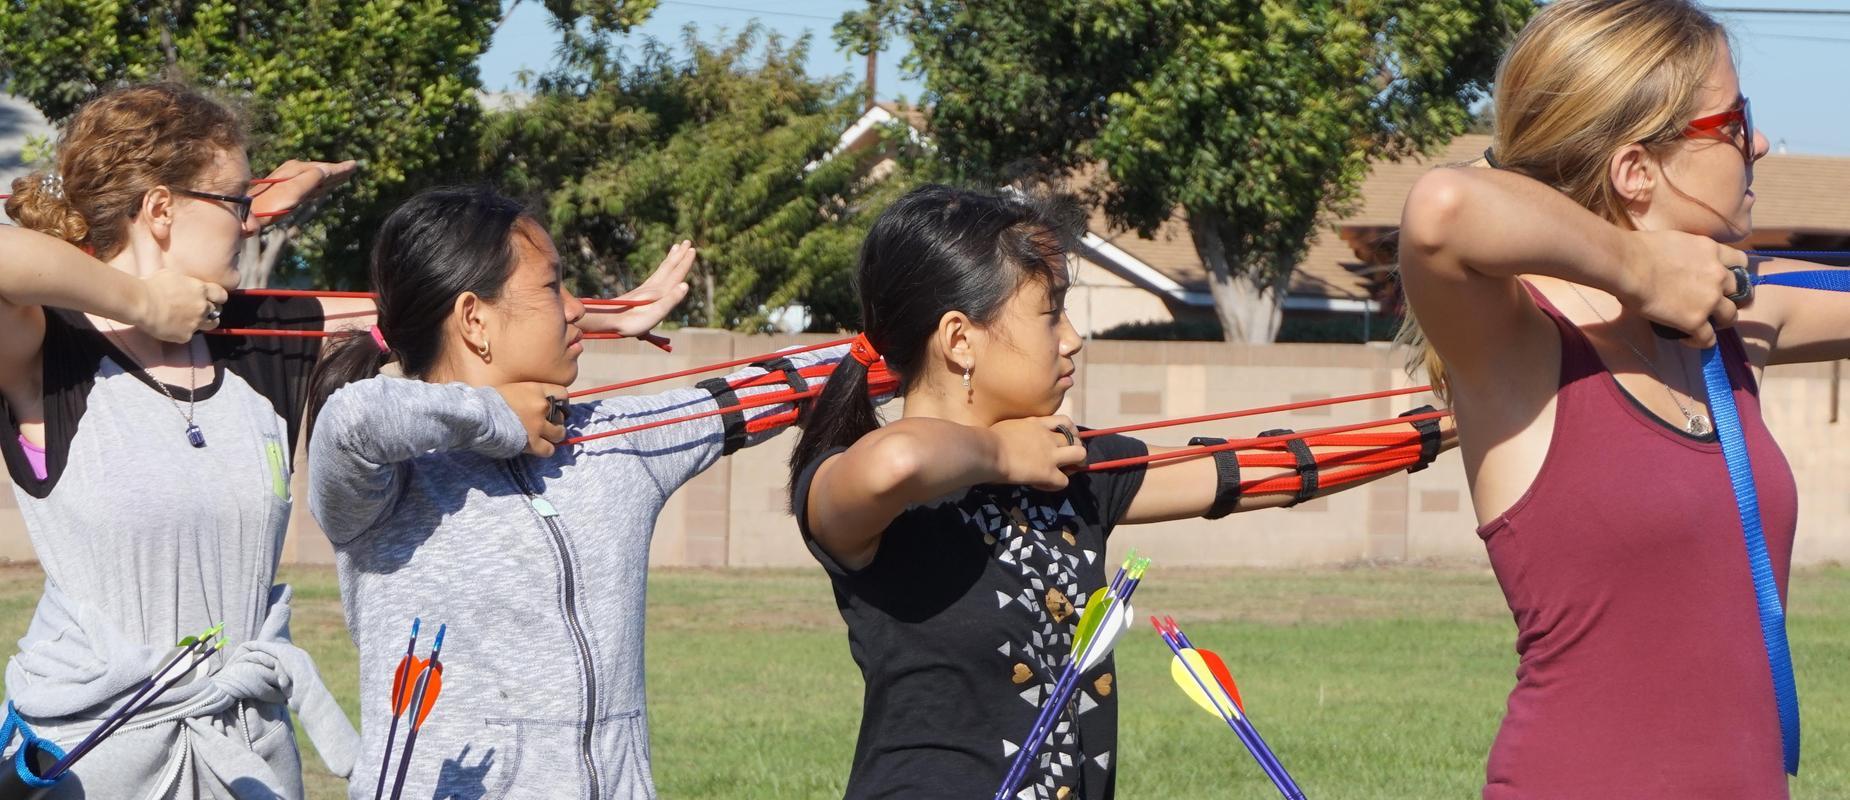 archery team picture